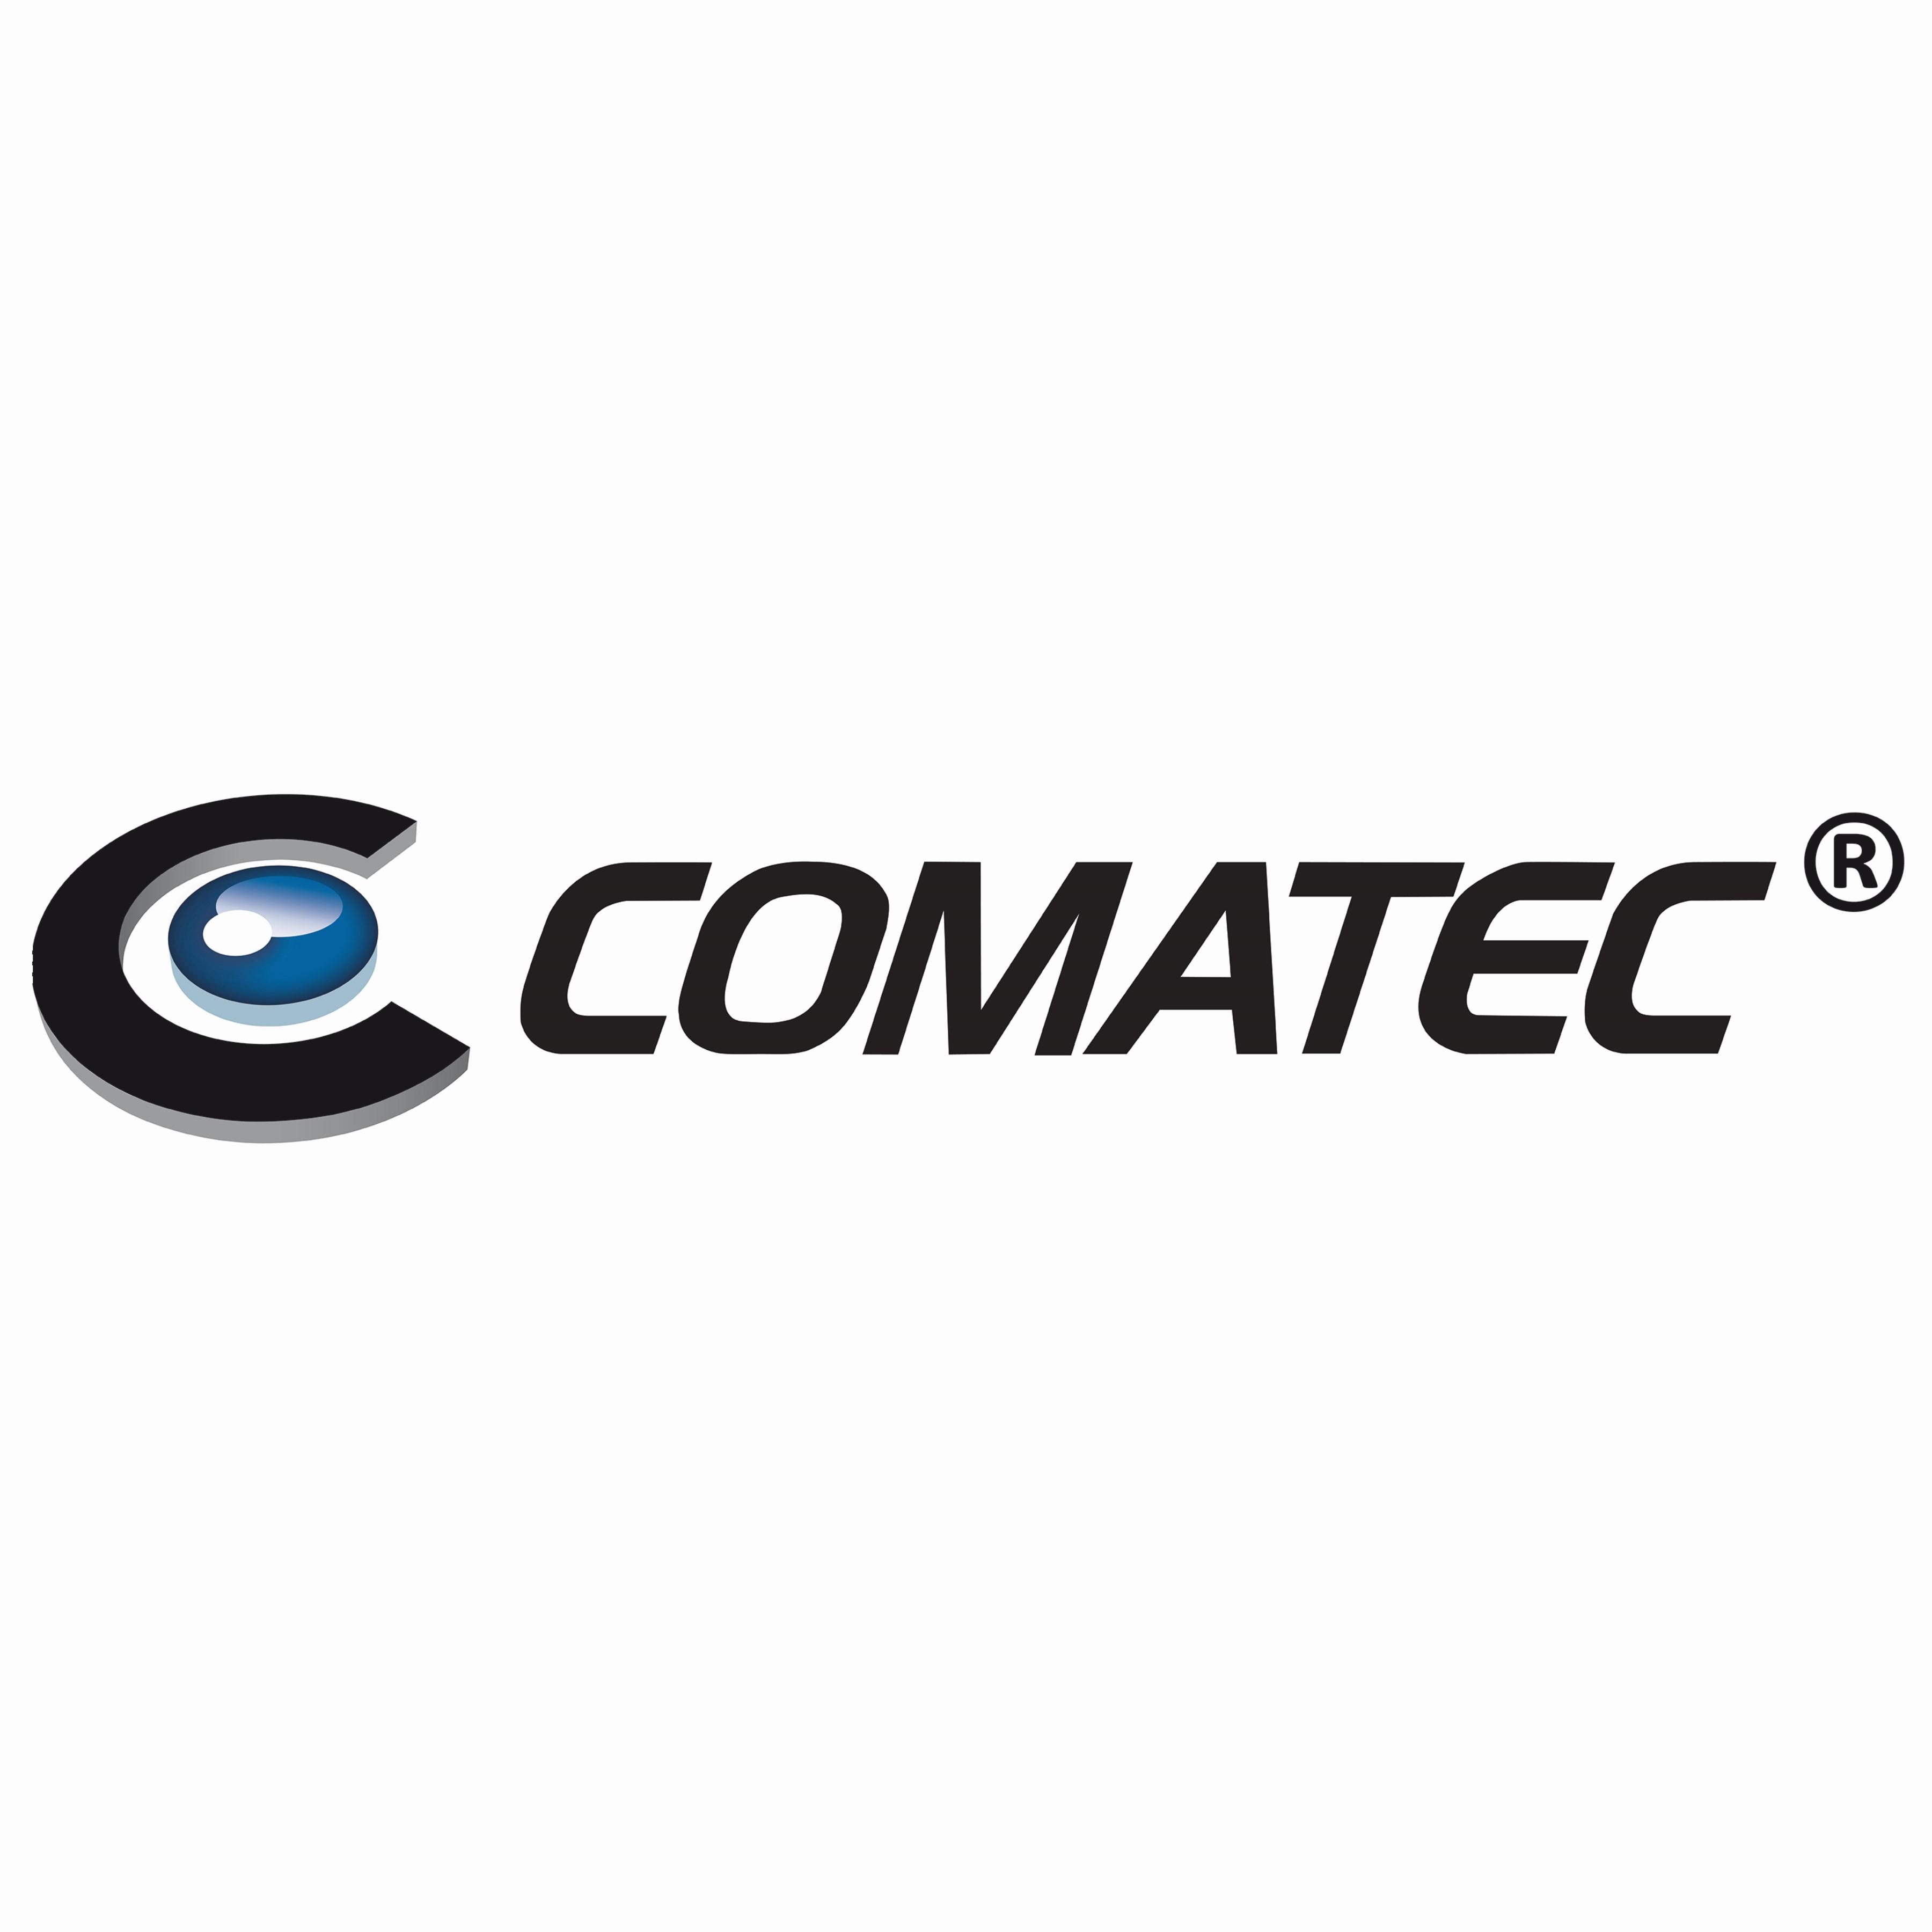 Comatec Group